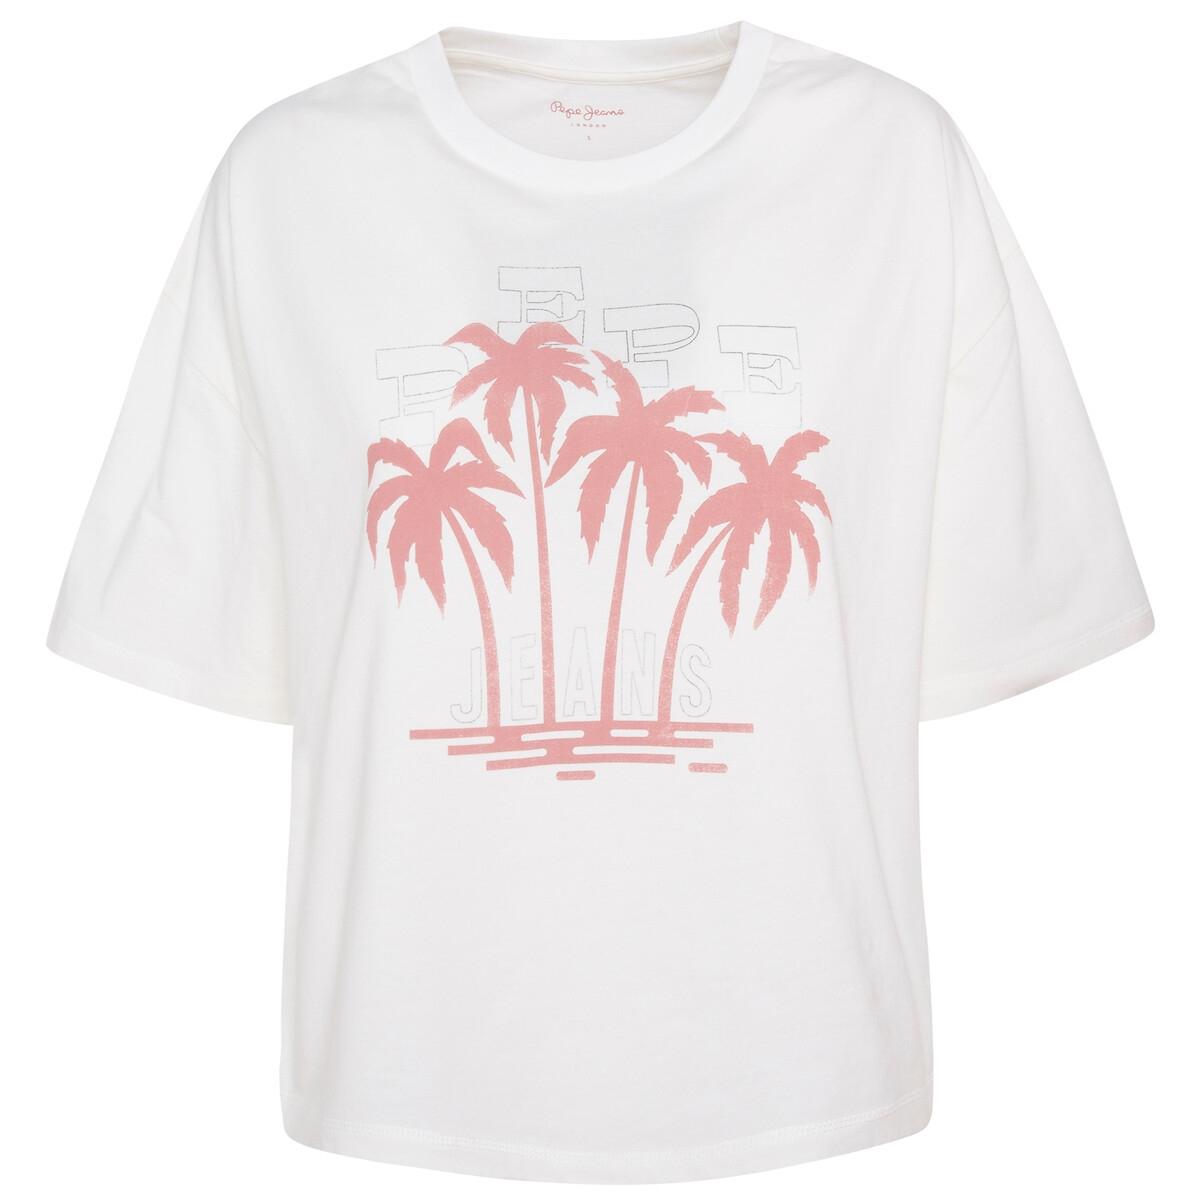 Camiseta de manga corta, estampado delante